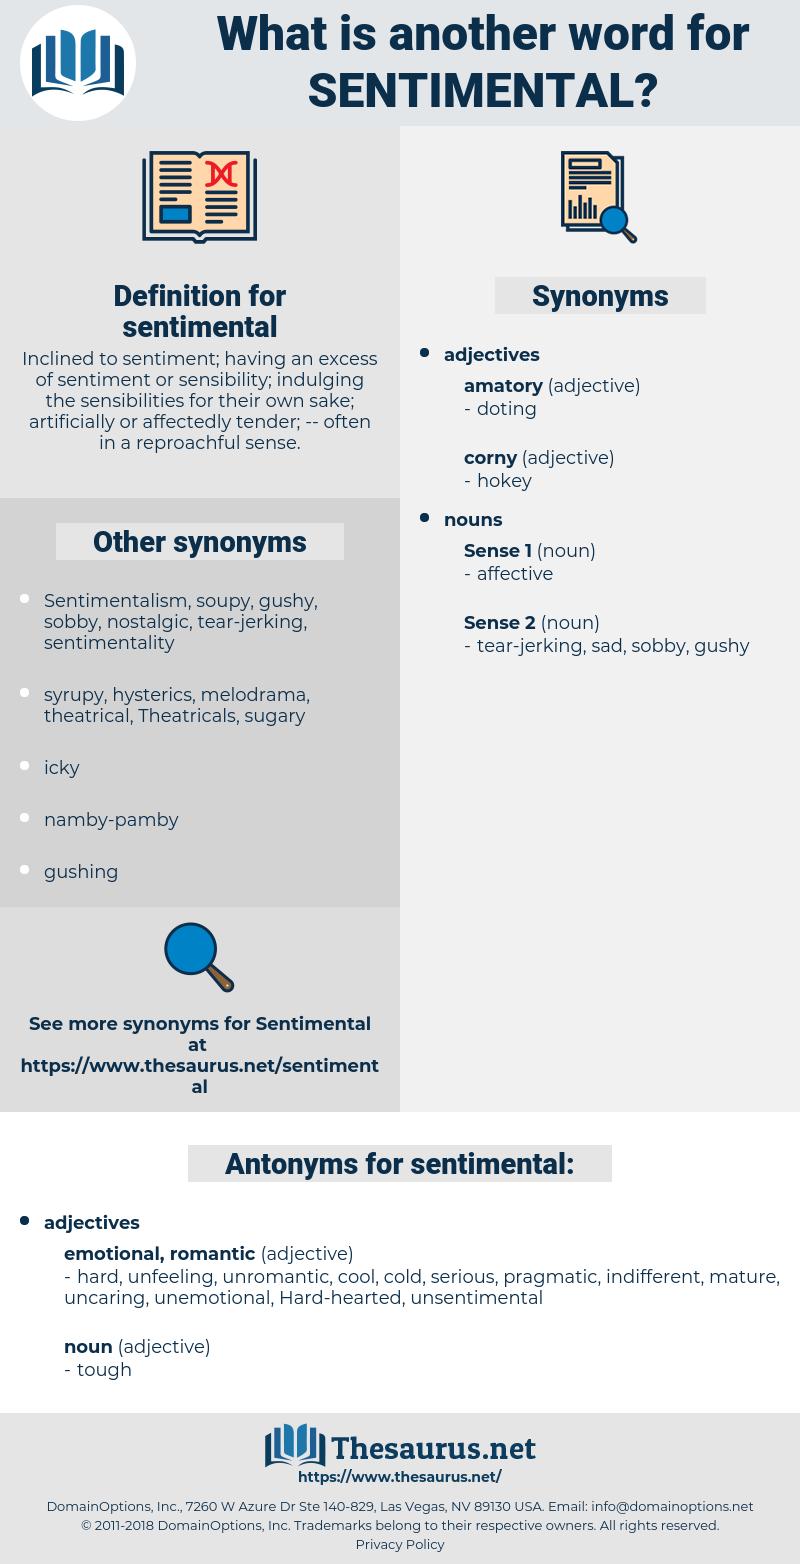 sentimental, synonym sentimental, another word for sentimental, words like sentimental, thesaurus sentimental